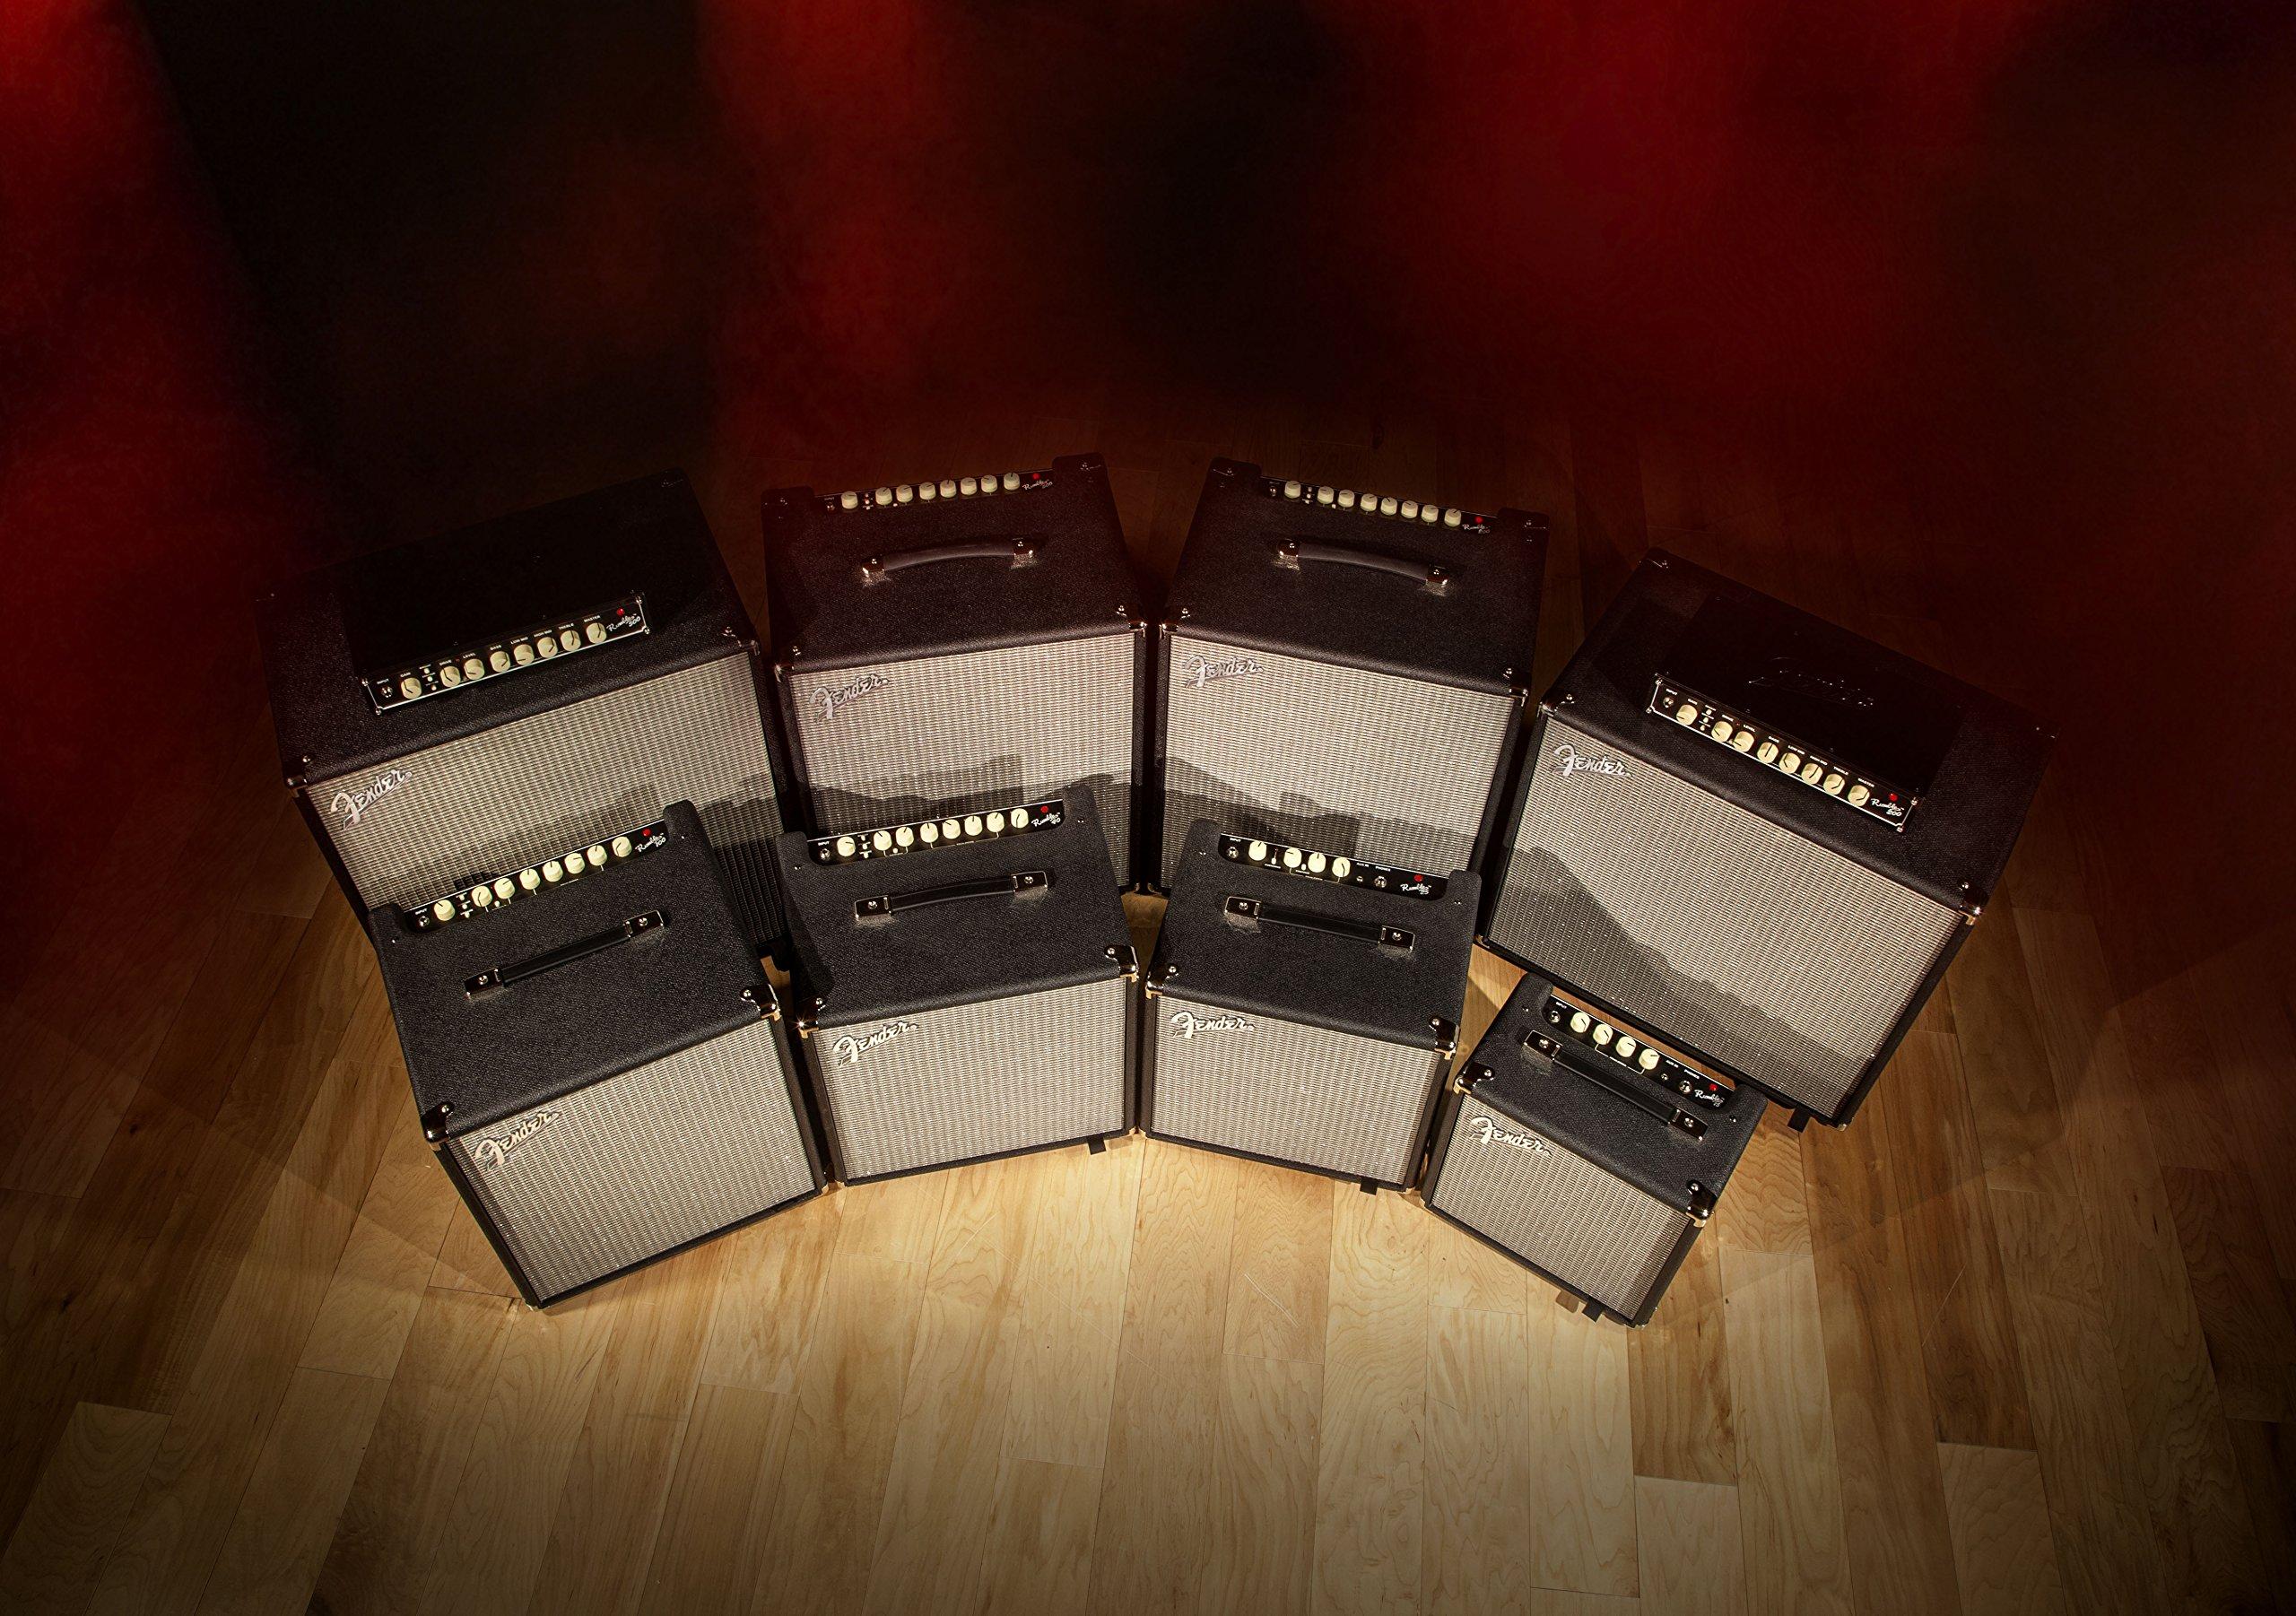 Fender Rumble 100 v3 Bass Combo Amplifier by Fender